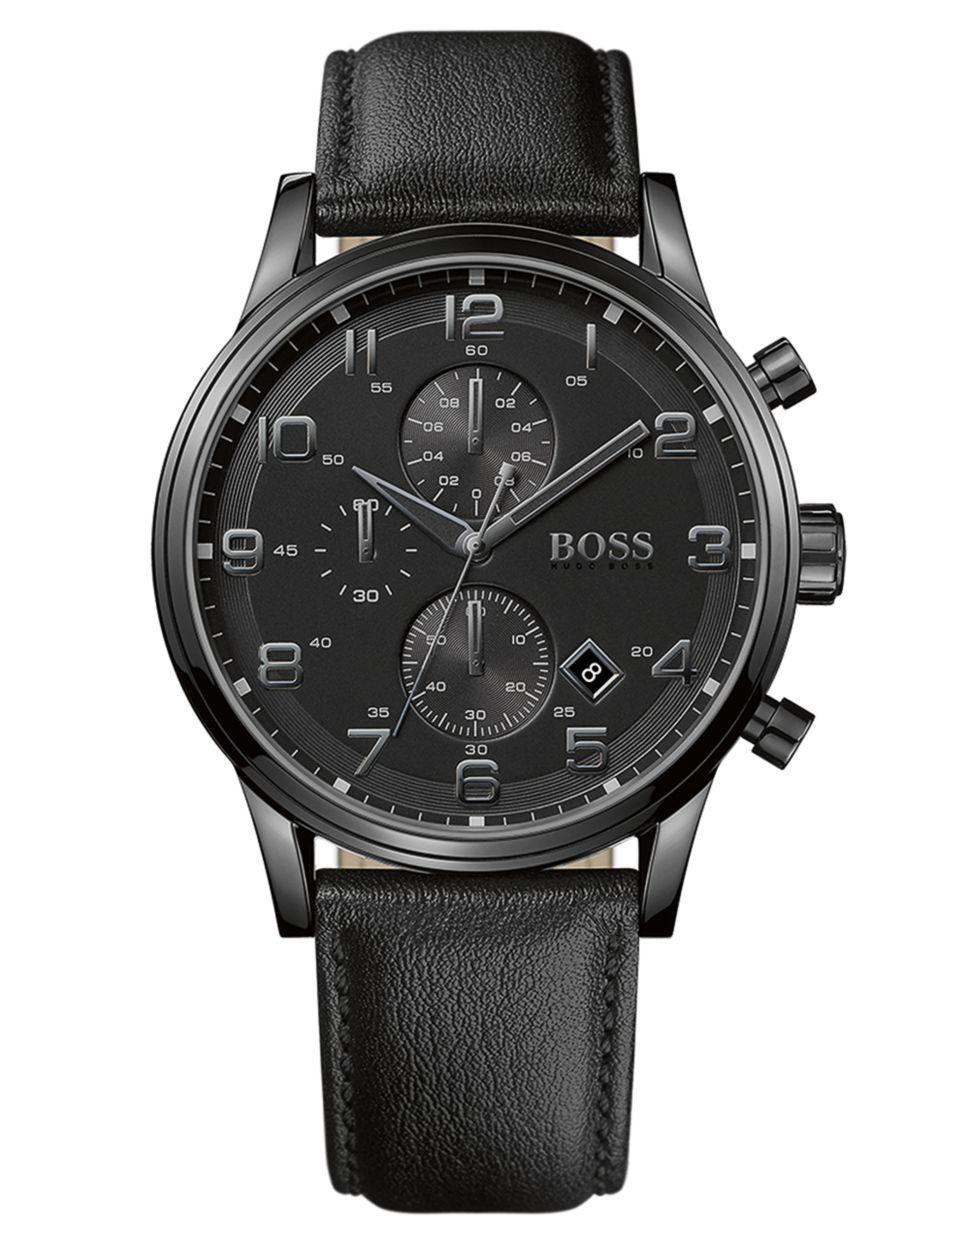 Boss men 39 s chronograph black leather strap 44mm 1512567 in black for men save 68 lyst for Black leather strap men